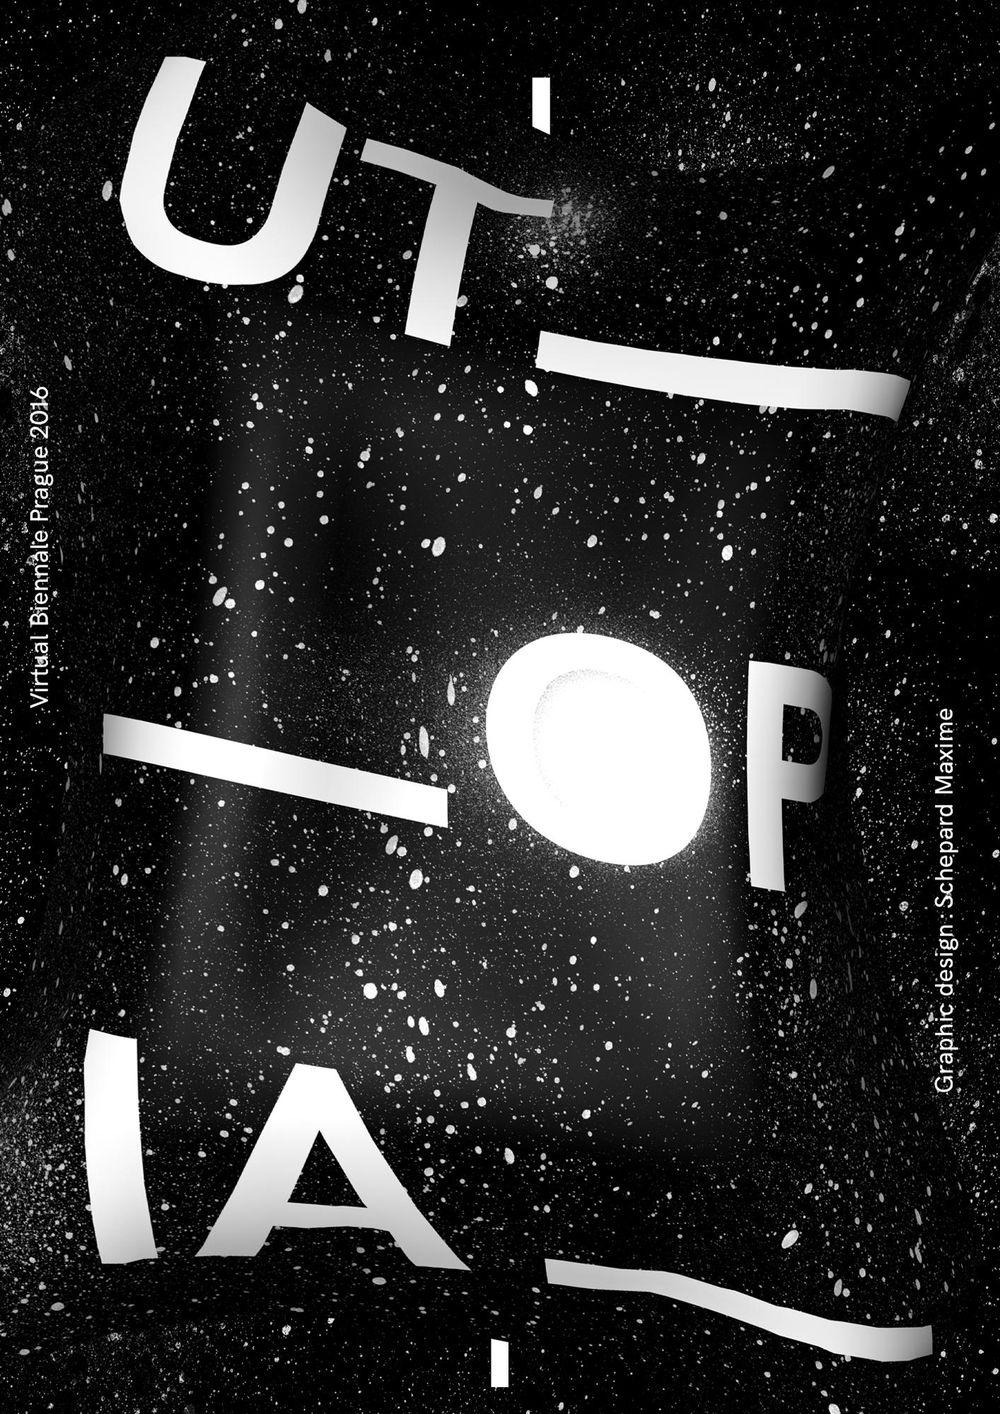 UTOPIA - image 1 - student project